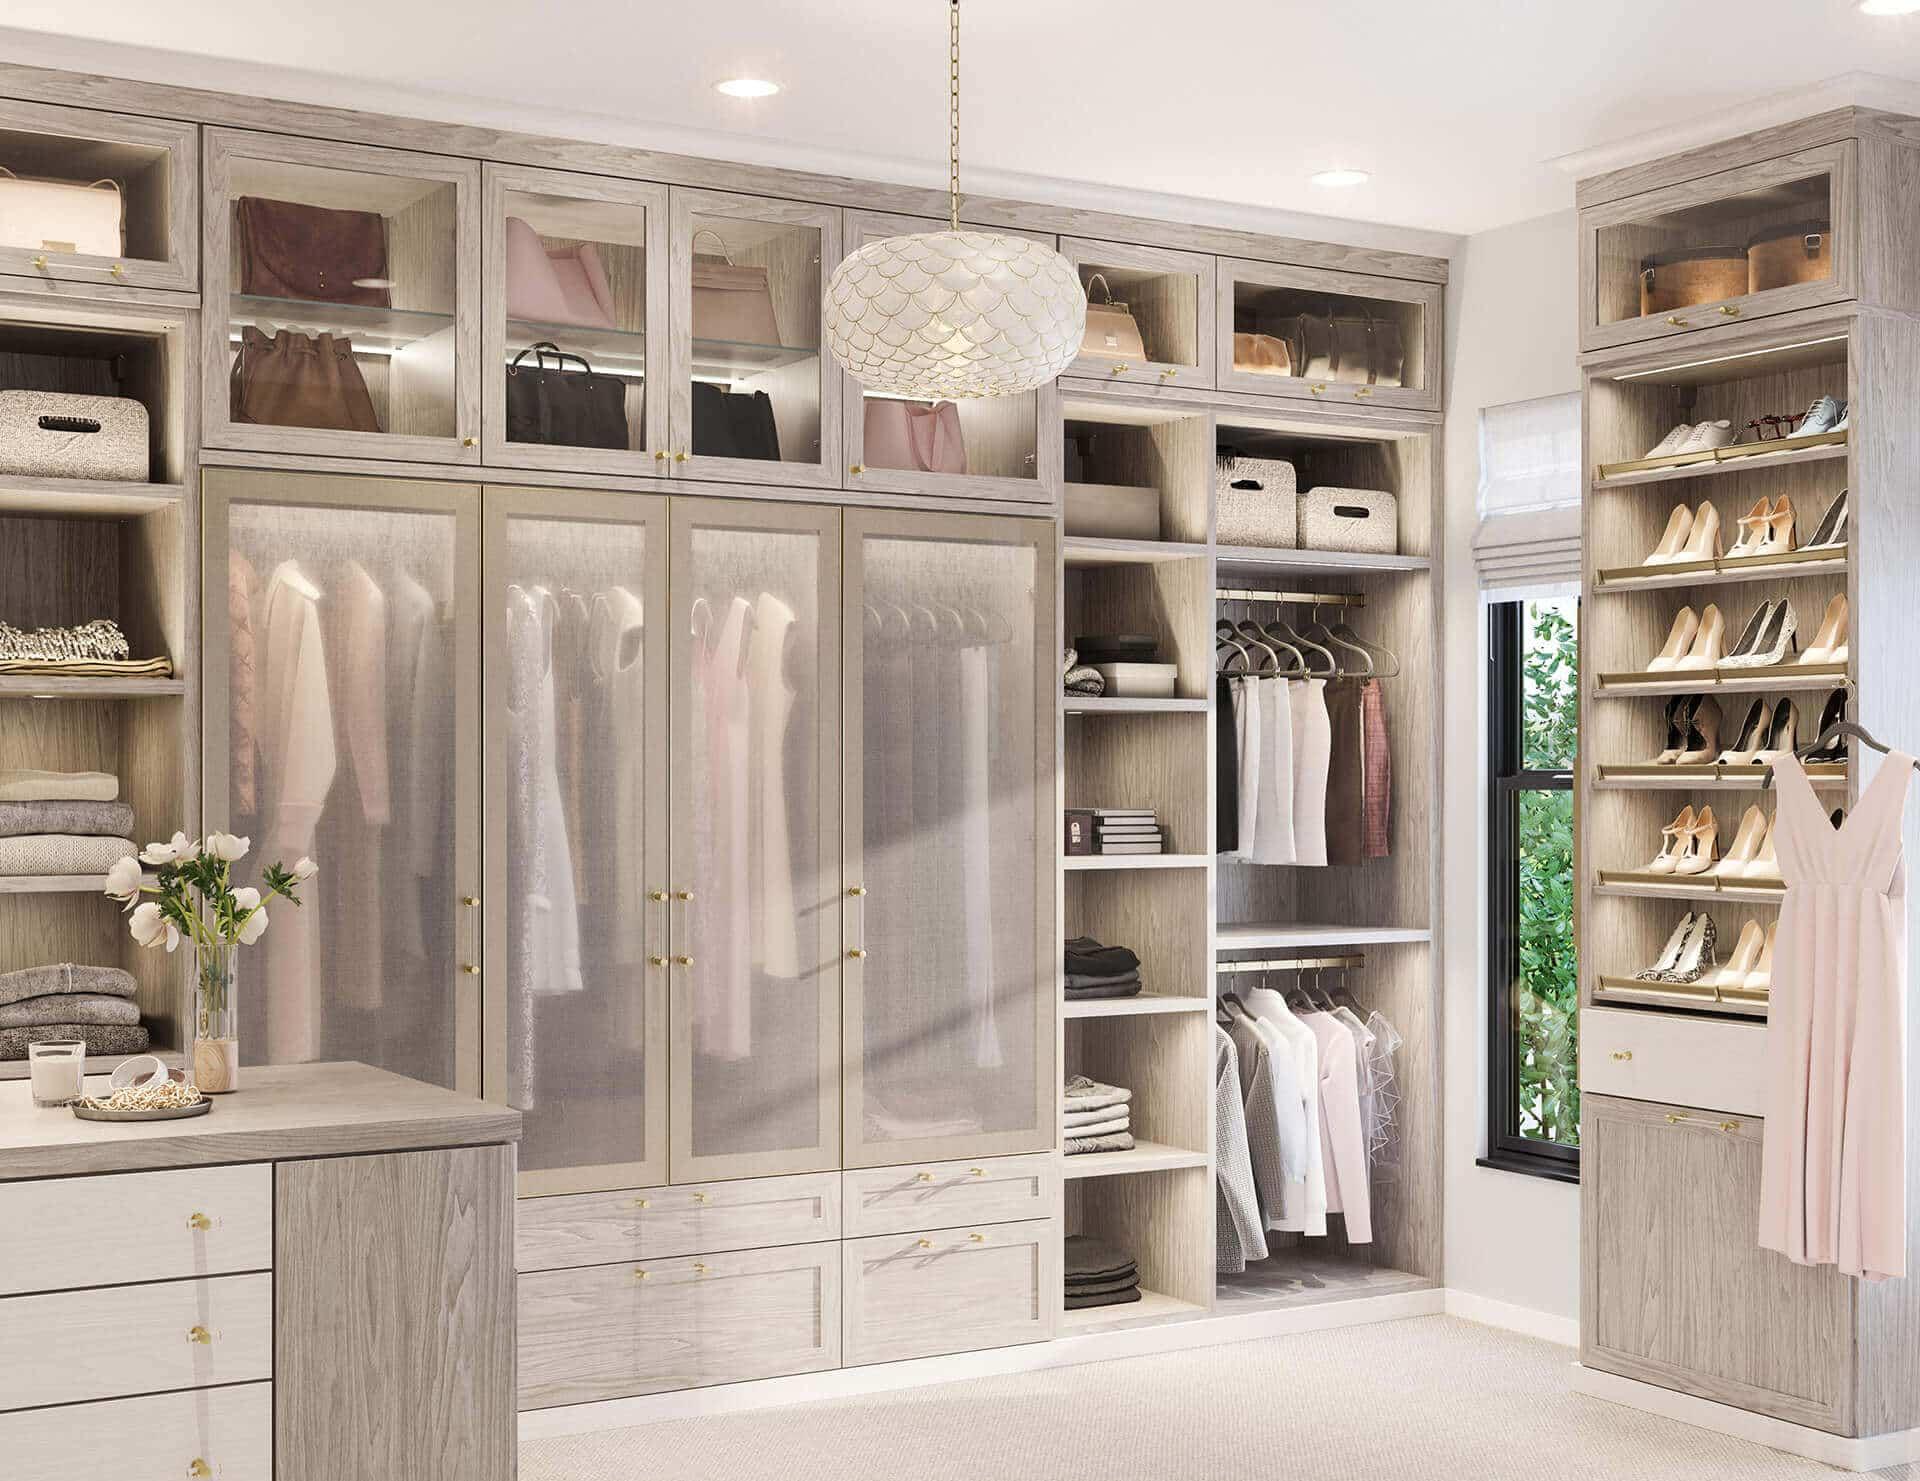 30+ Best Walk in Closet Designs Ideas. - Live Enhanced